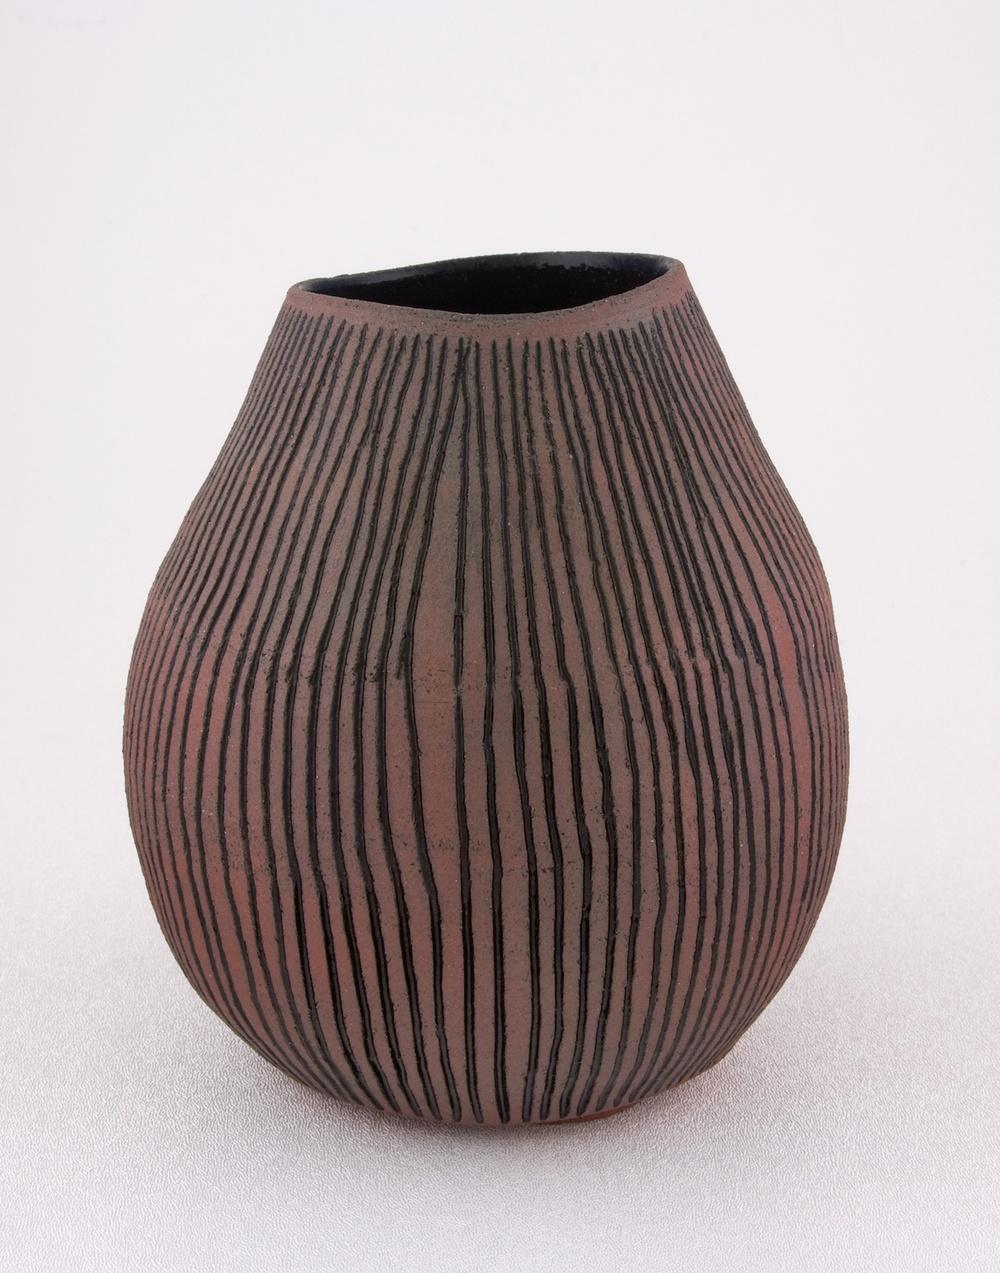 Shio Kusaka  Untitled (carved stripe 3)  2009 Porcelain 6 ½h x 6 ½w in SK023